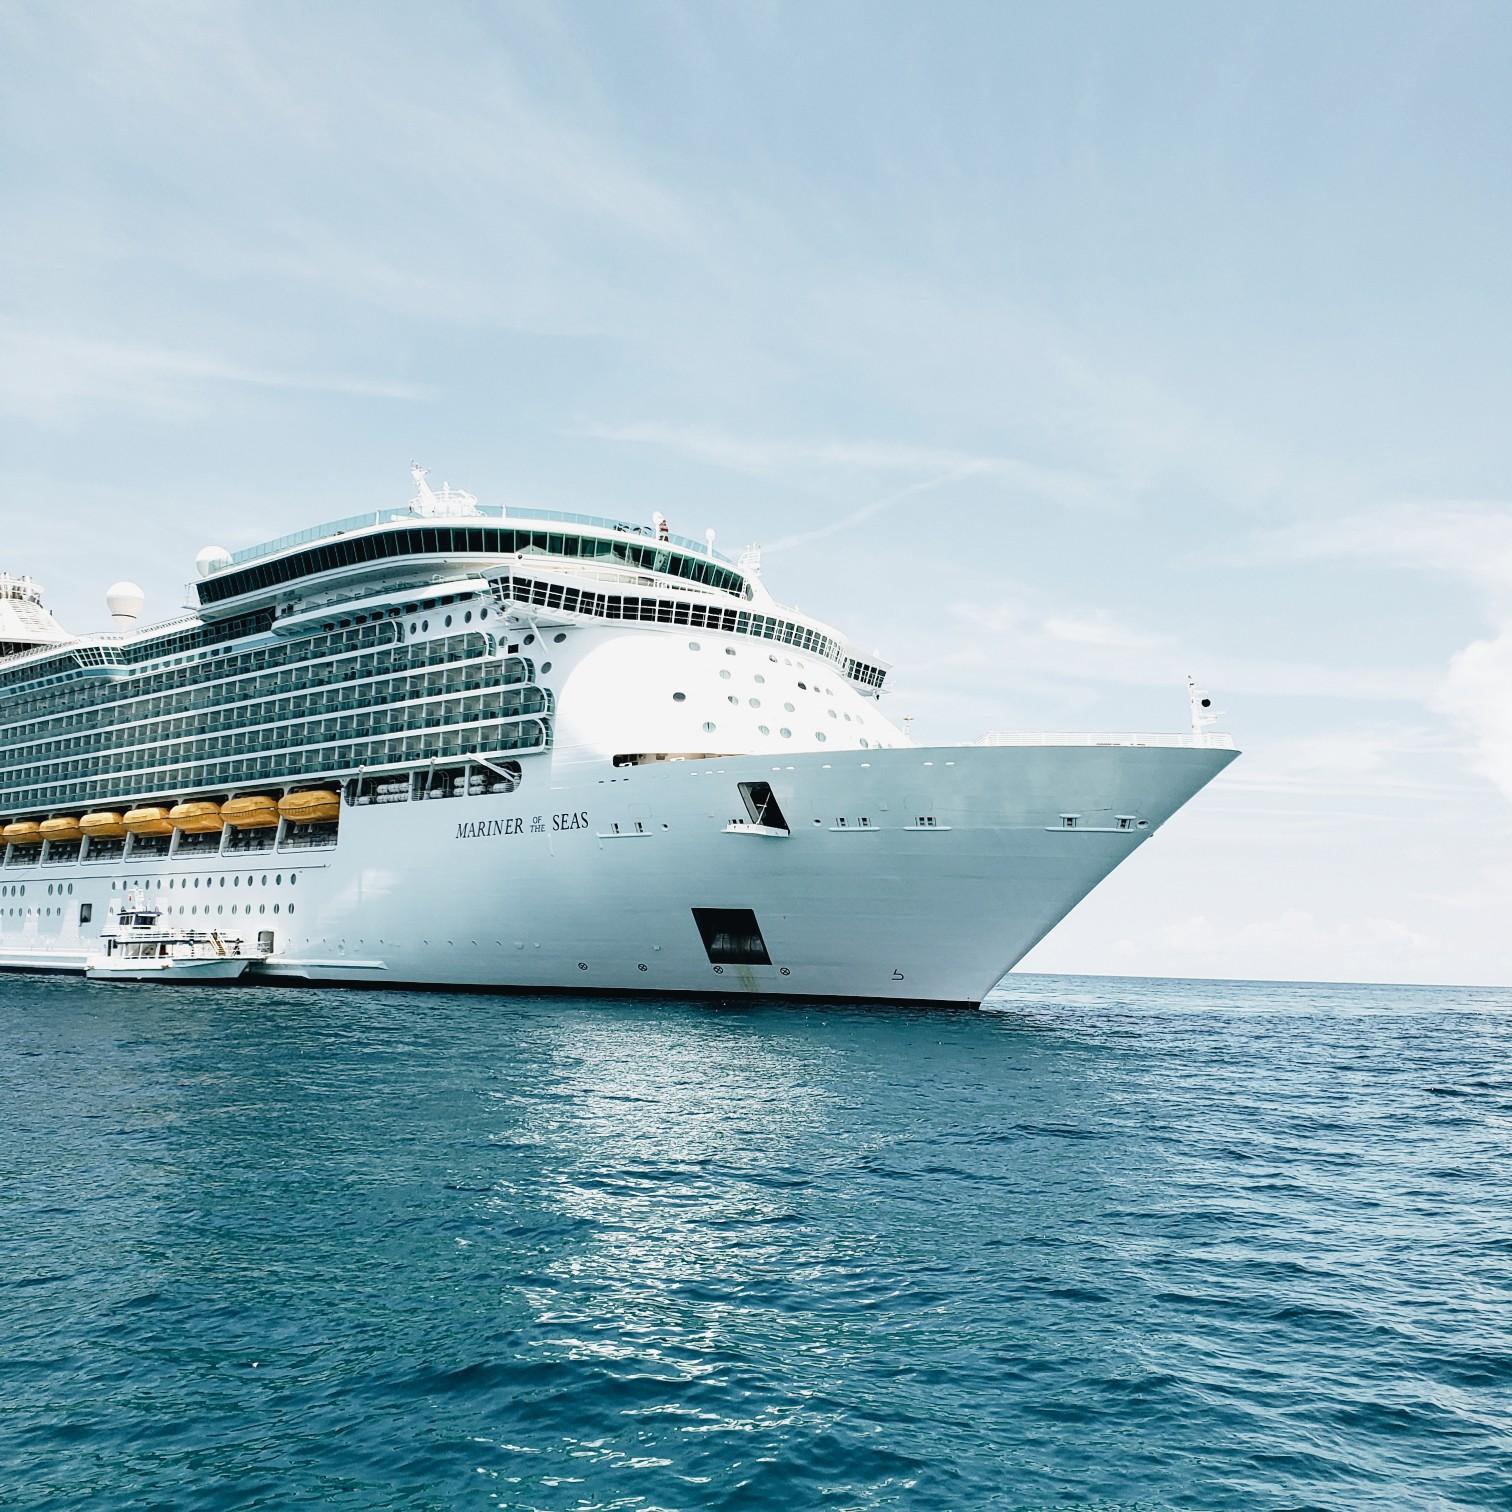 royal caribbean mariner of the seas on the ocean